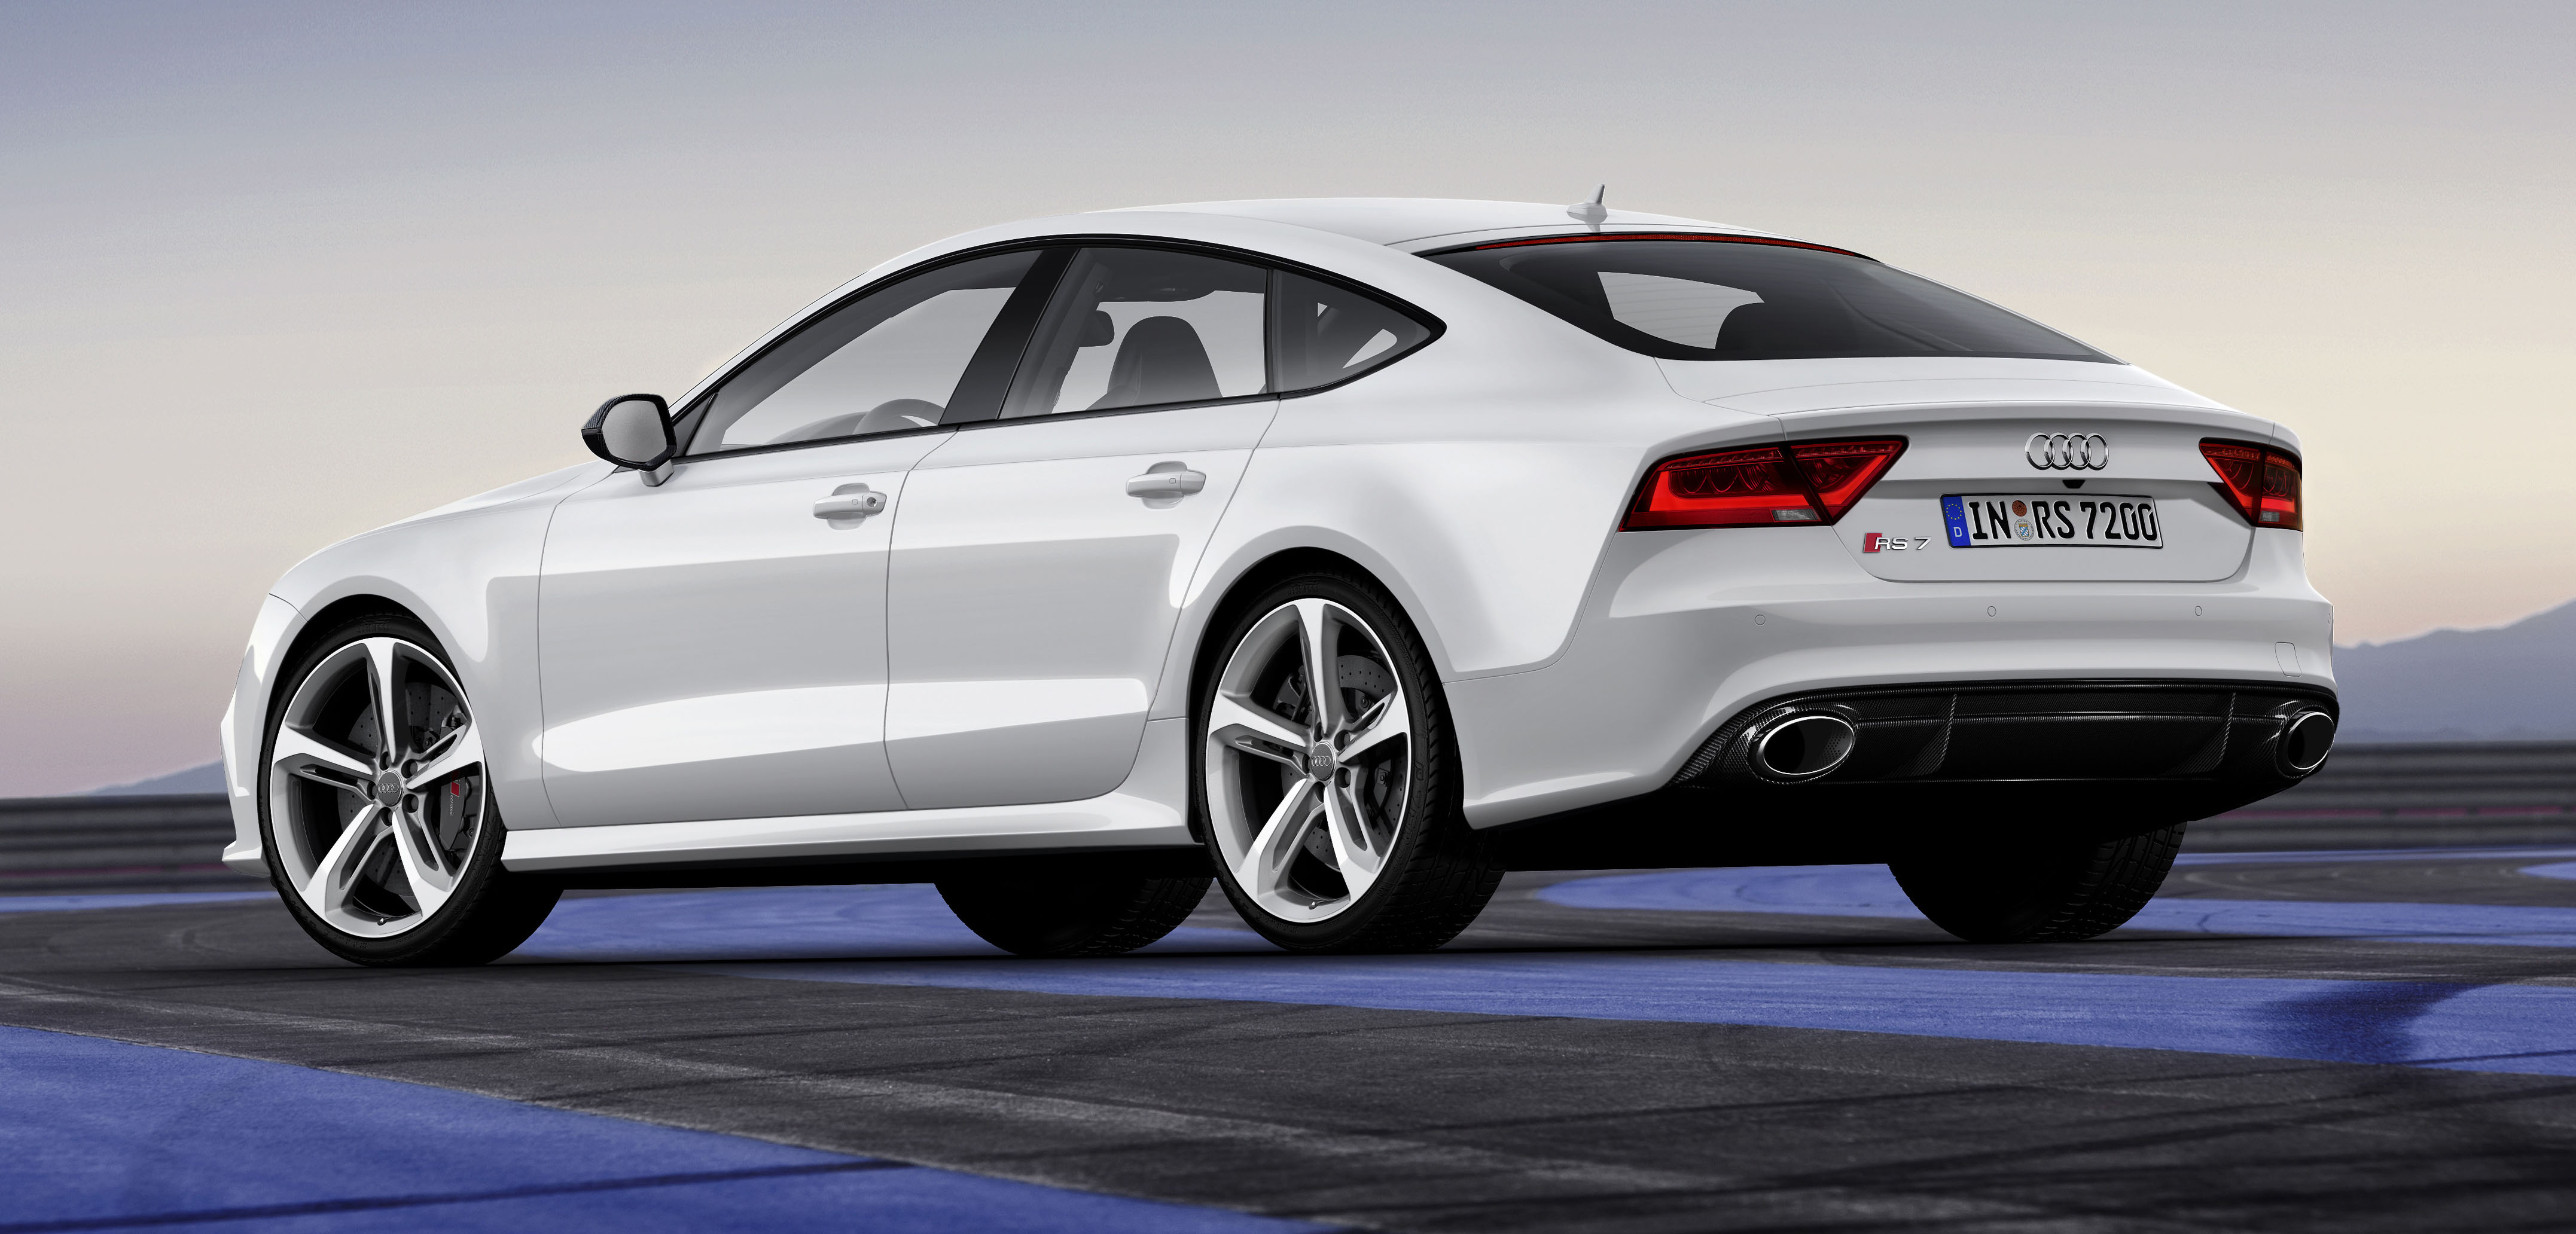 Audi Rs7 Sportback A Sexier Alternative To An Avant Paul